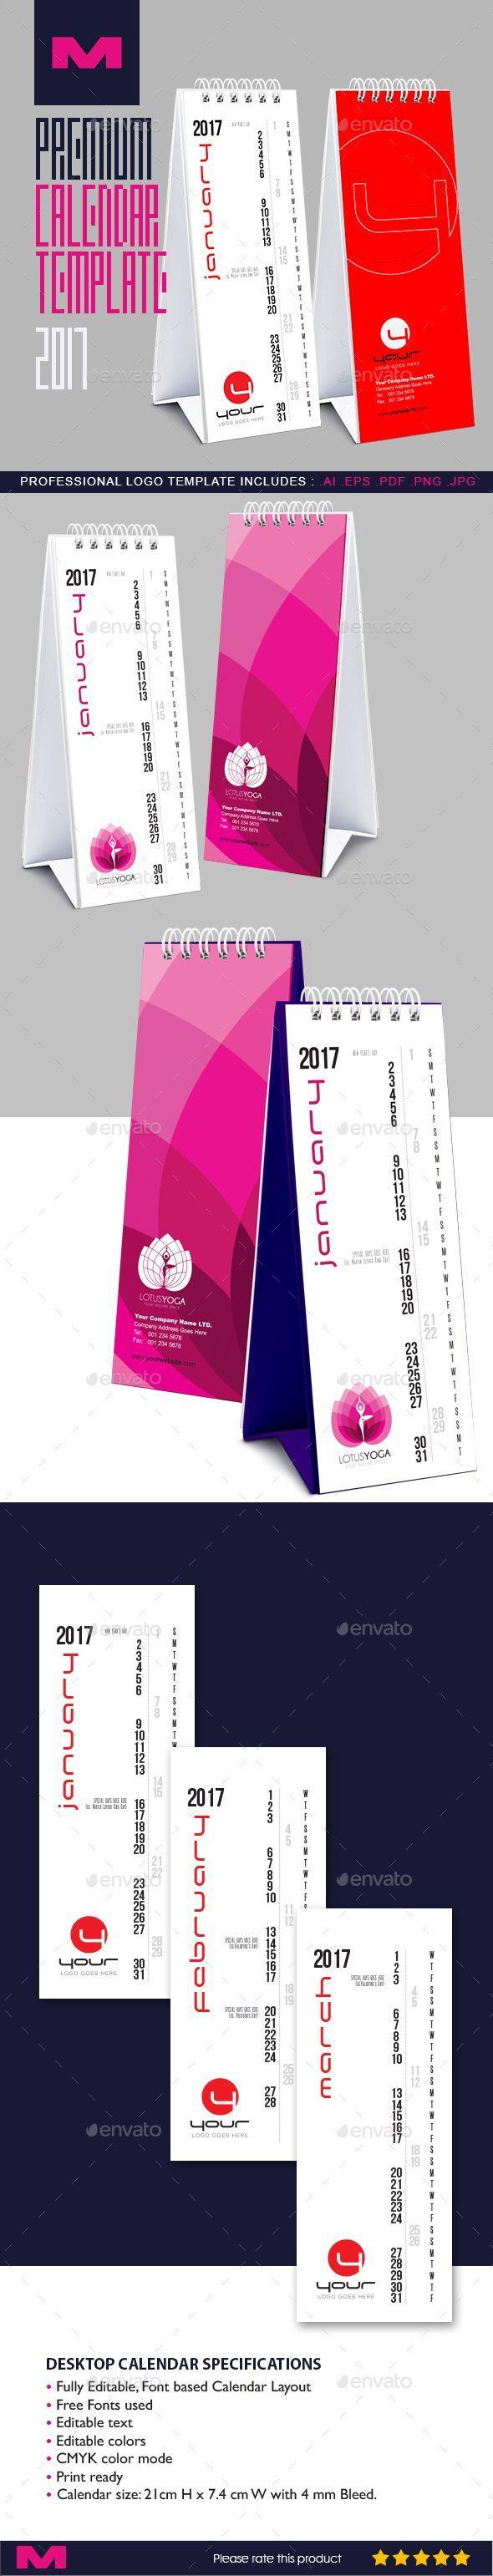 Premium Desktop Calendar Template 2017 - Stationery Print